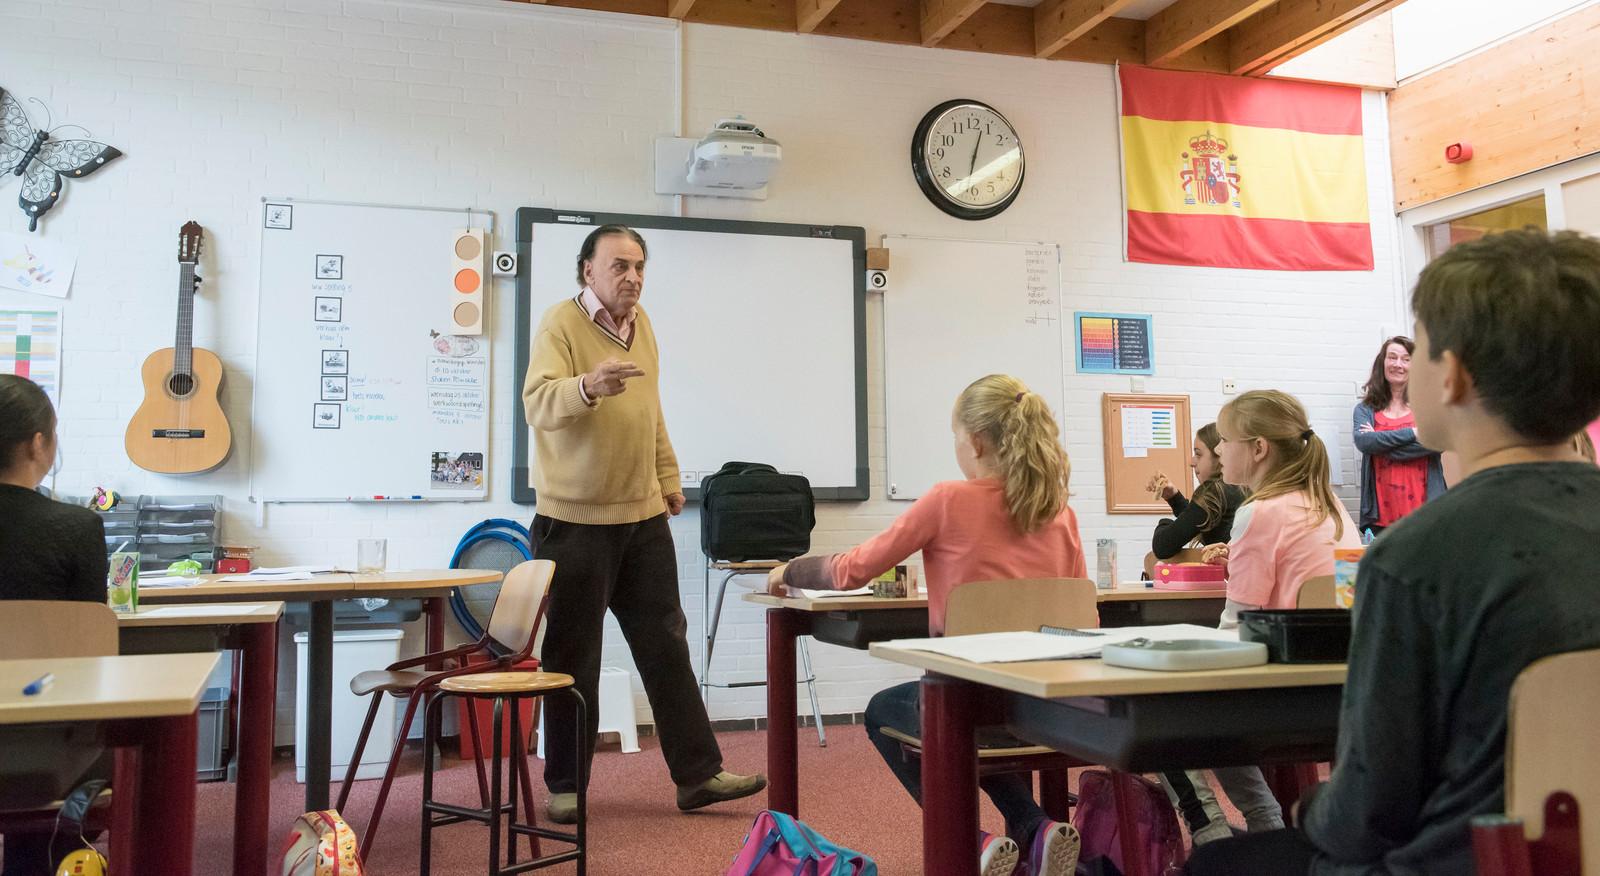 Hola En Veel Meer Spaans Wordt Opgedreund In Puttens Klaslokaal